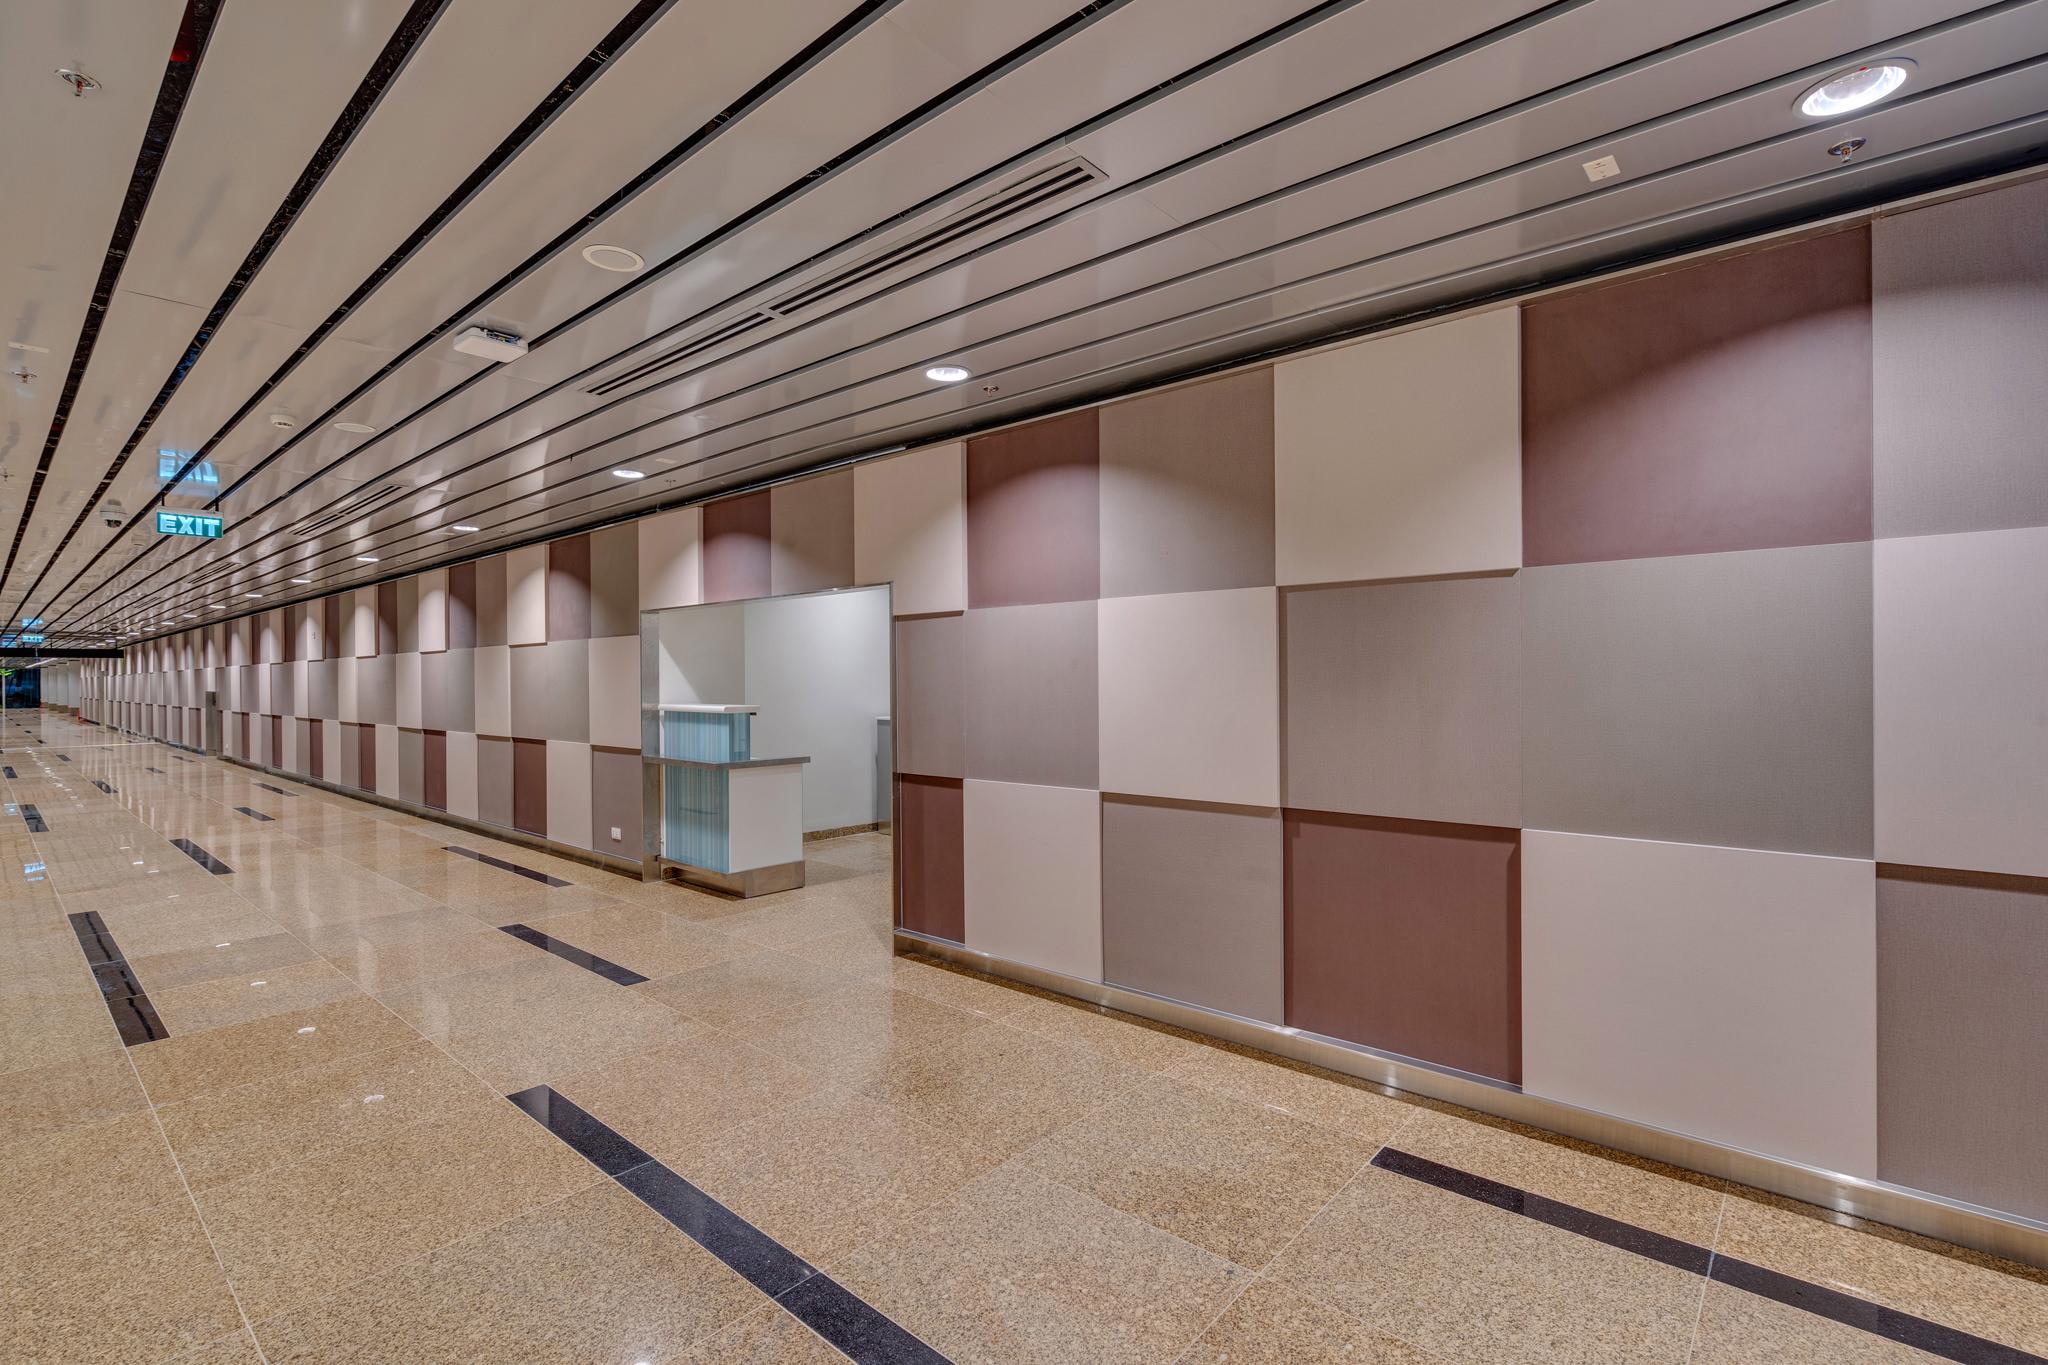 20180626 - Cam Ranh Airport - Architecture - 0418.jpg